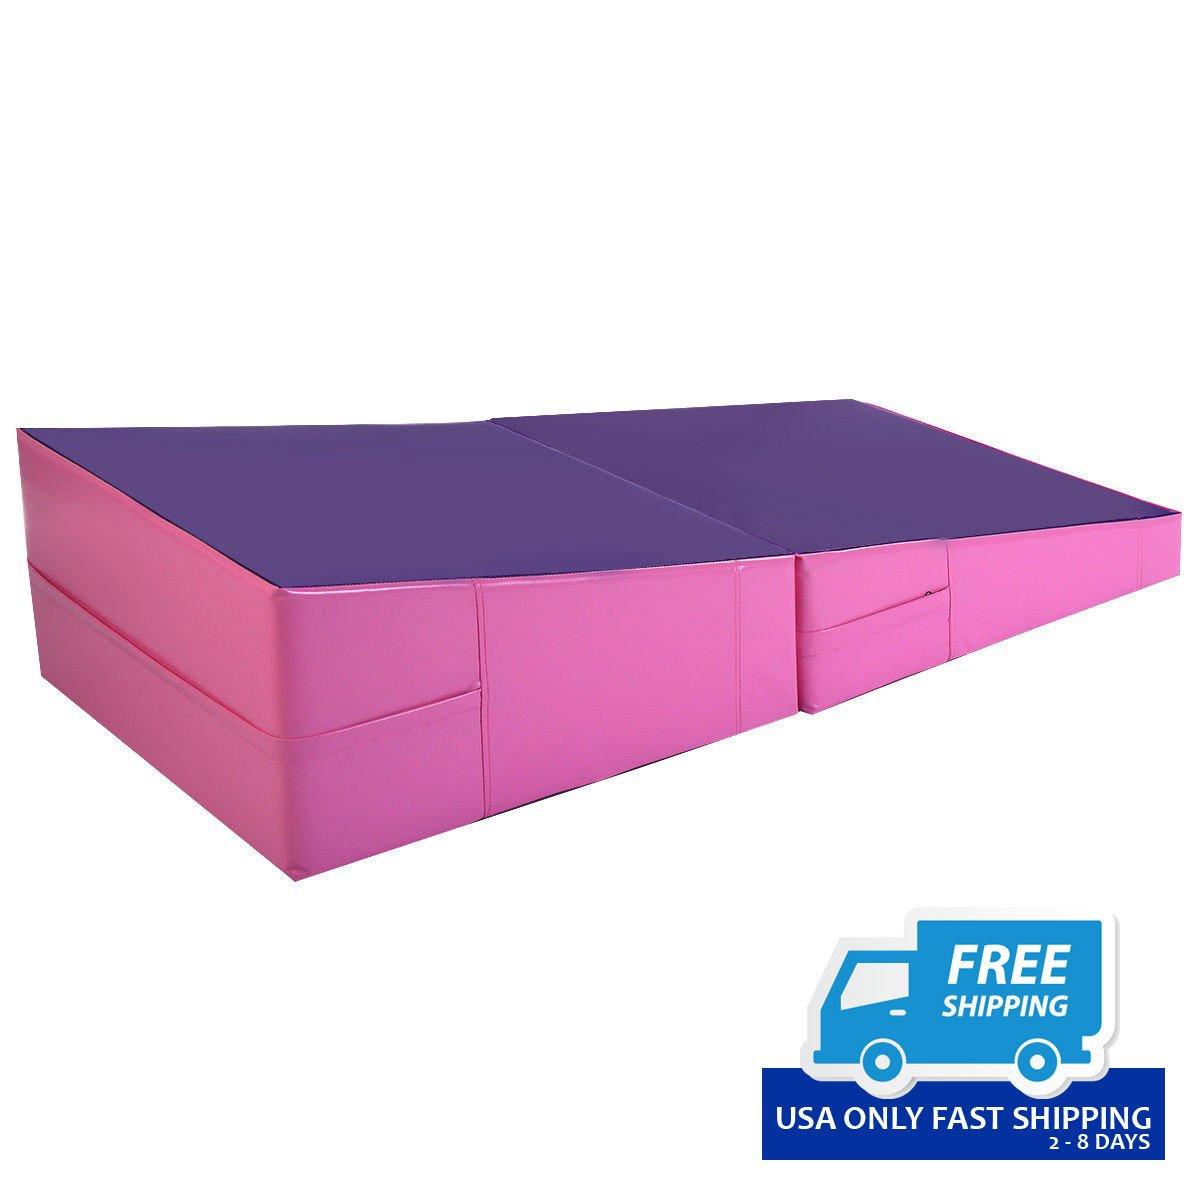 red incline to mancino preschool mats full gym royal click wedge gymnastics image blue pink psb mat view